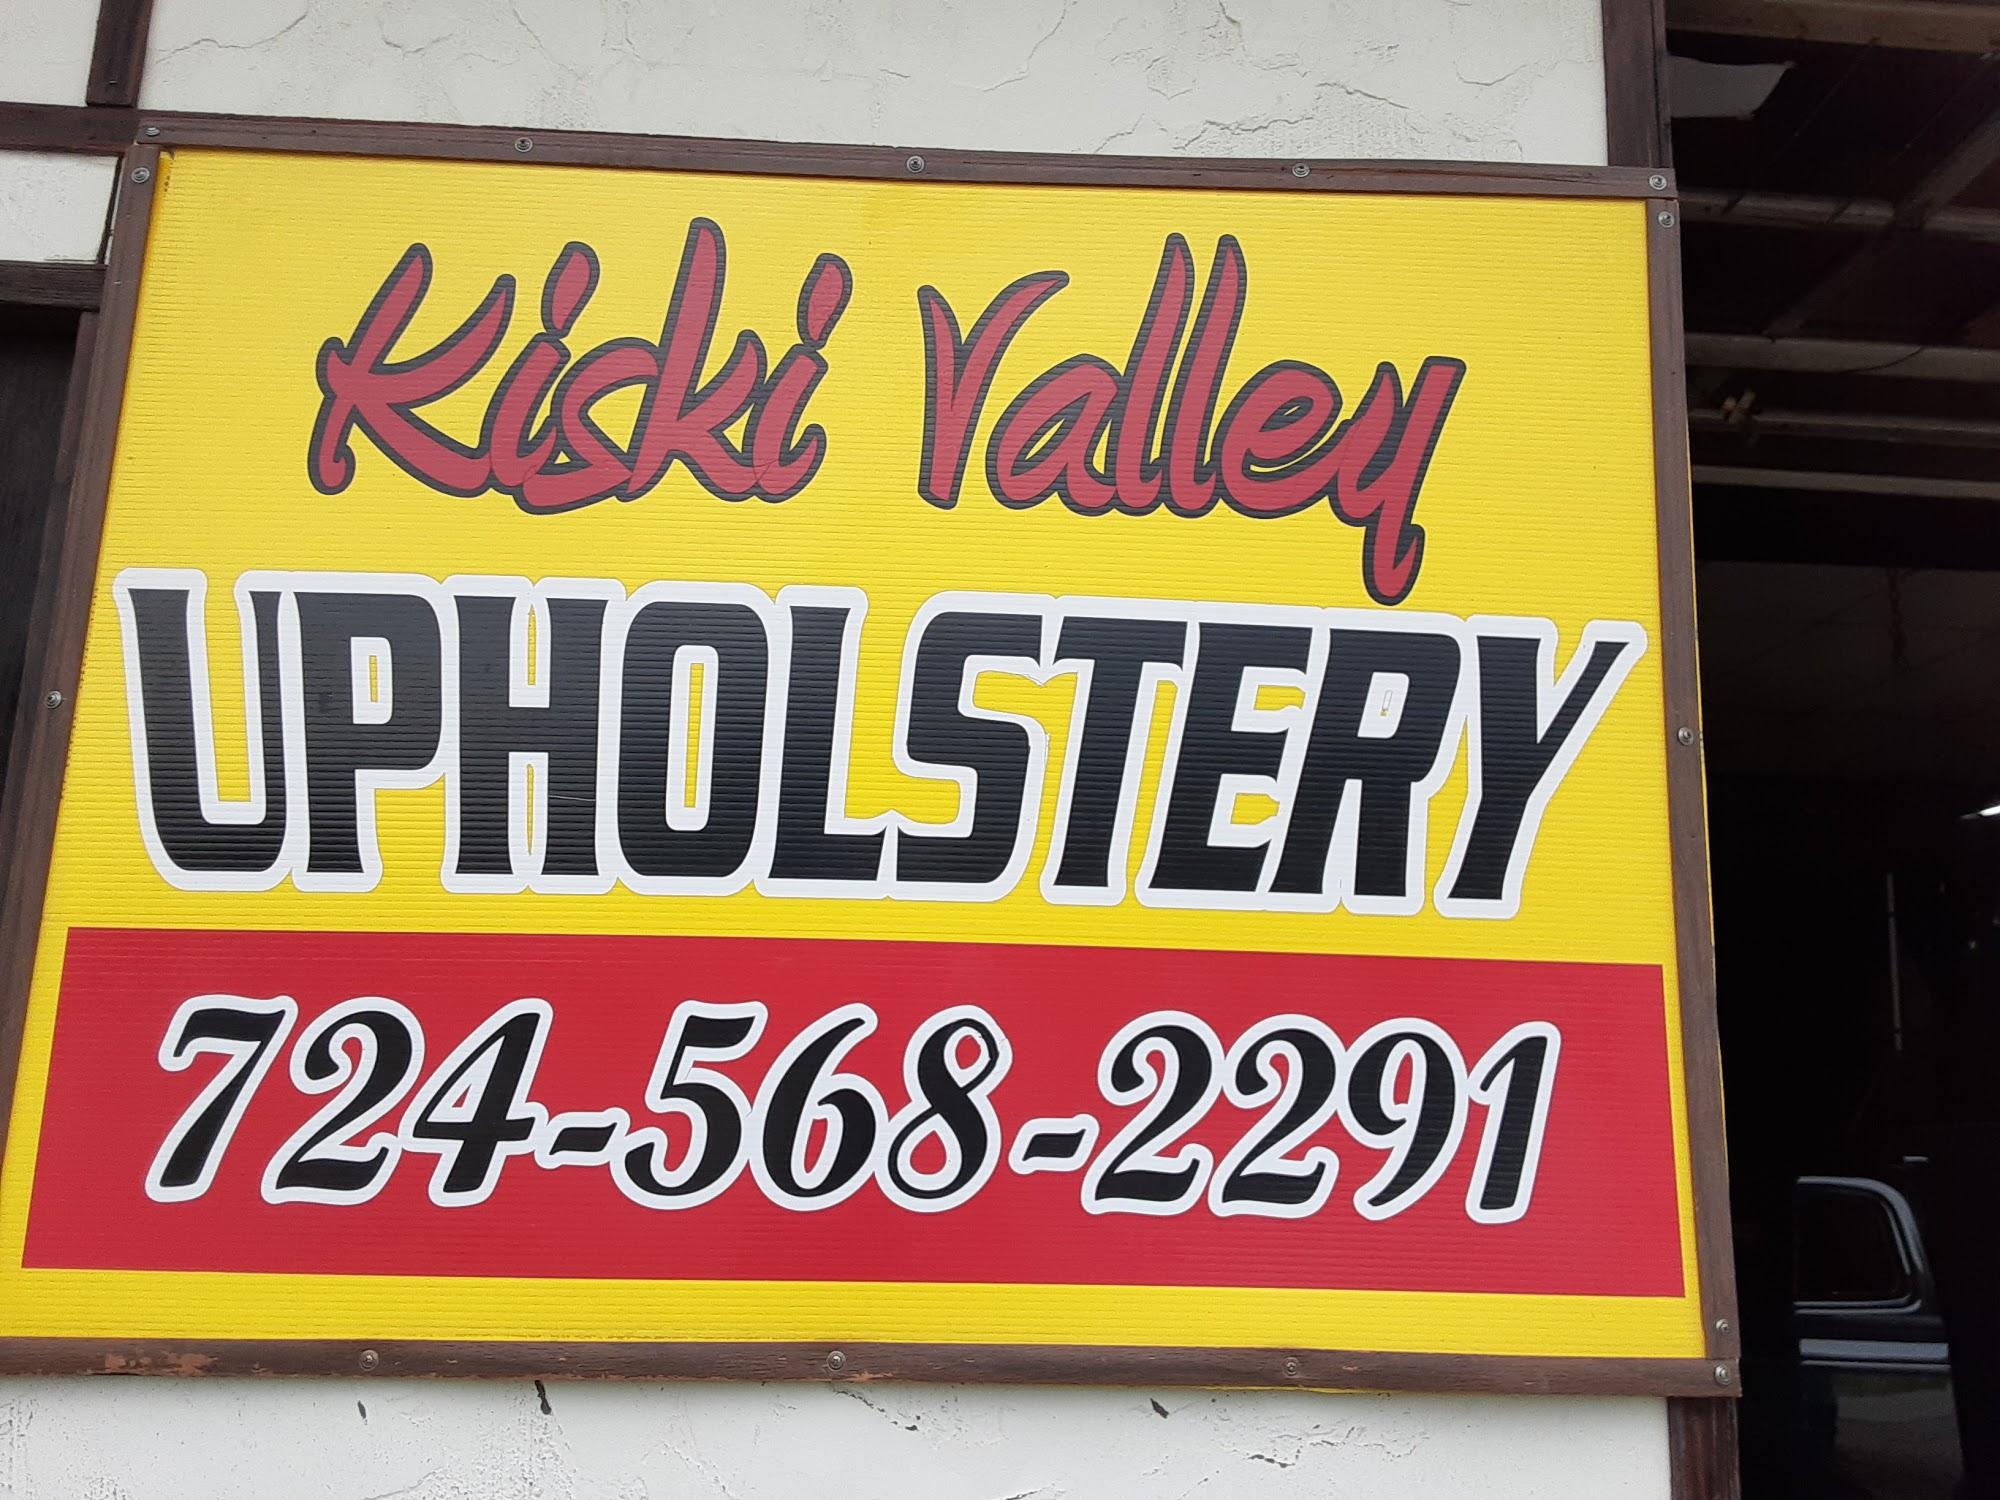 Kiski Valley Auto Upholstery